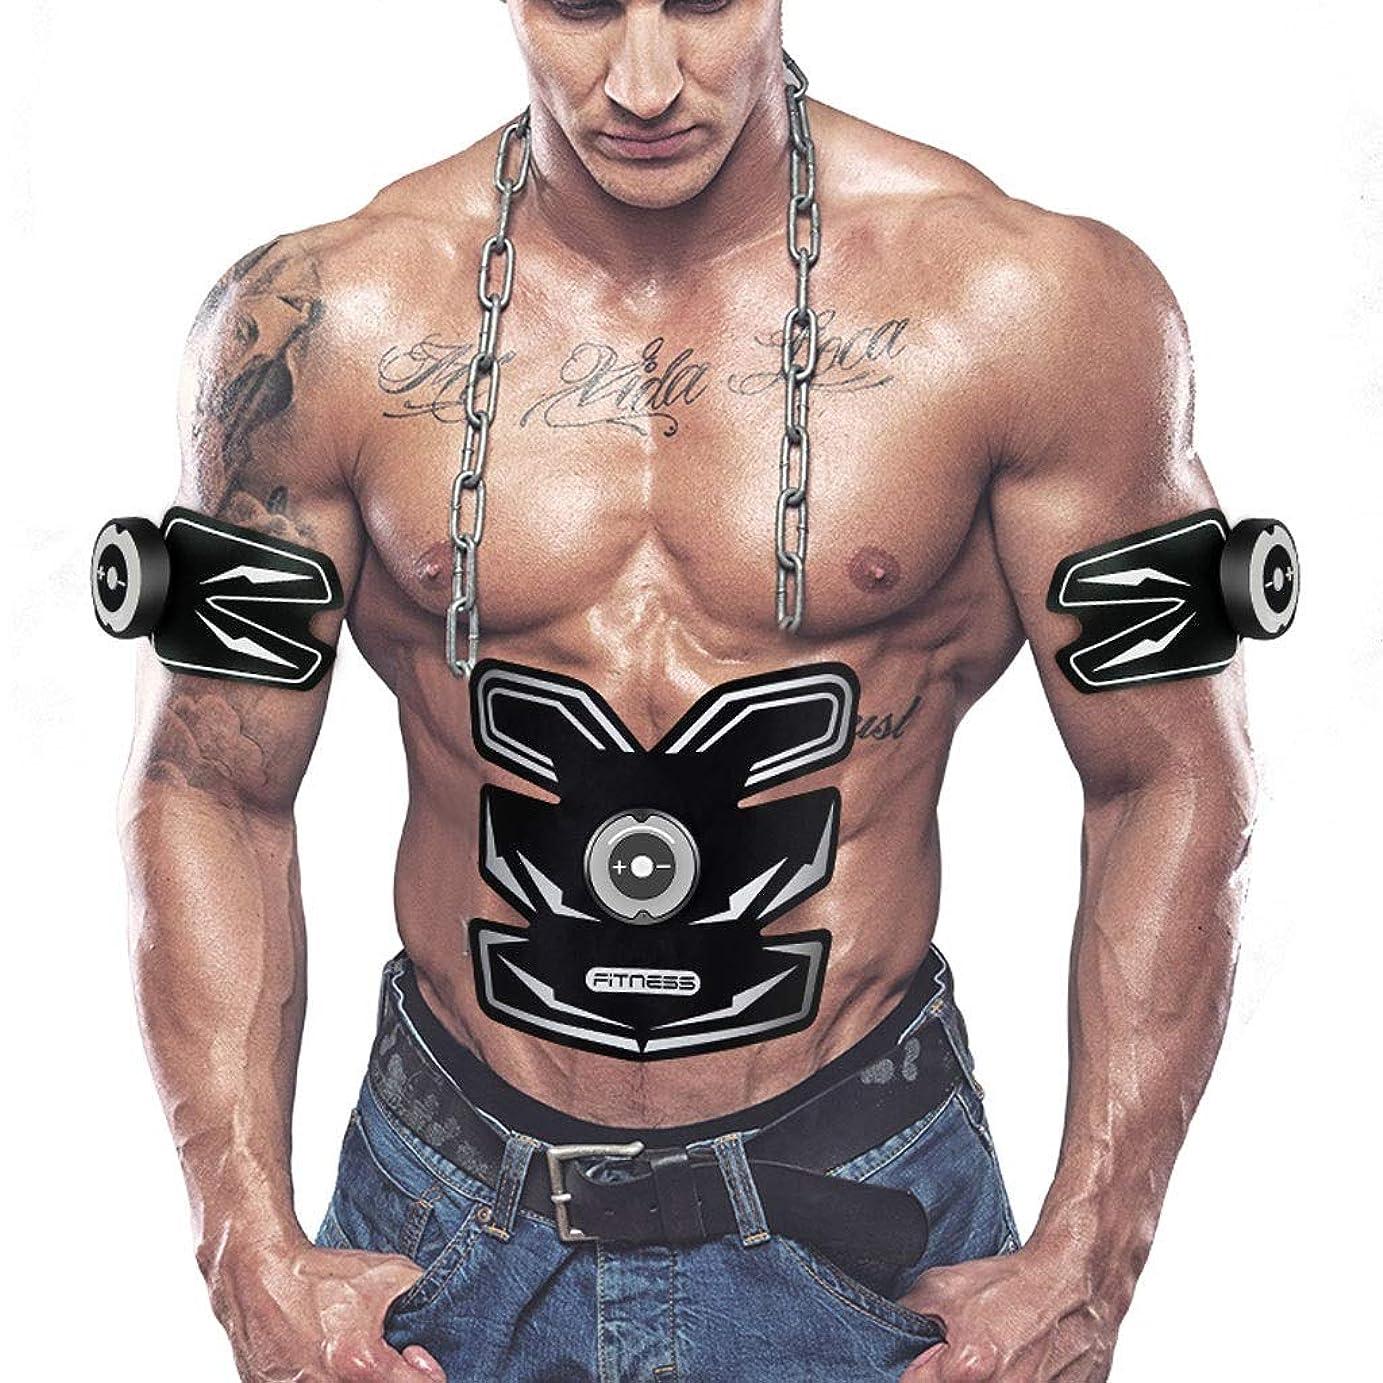 Absのトレーナーの適性の訓練ギヤ、リモート?コントロールのEMS筋肉刺激装置 - 人及び女性のためのUSBの再充電可能な最終的な腹部刺激装置筋肉トナー (Color : White)